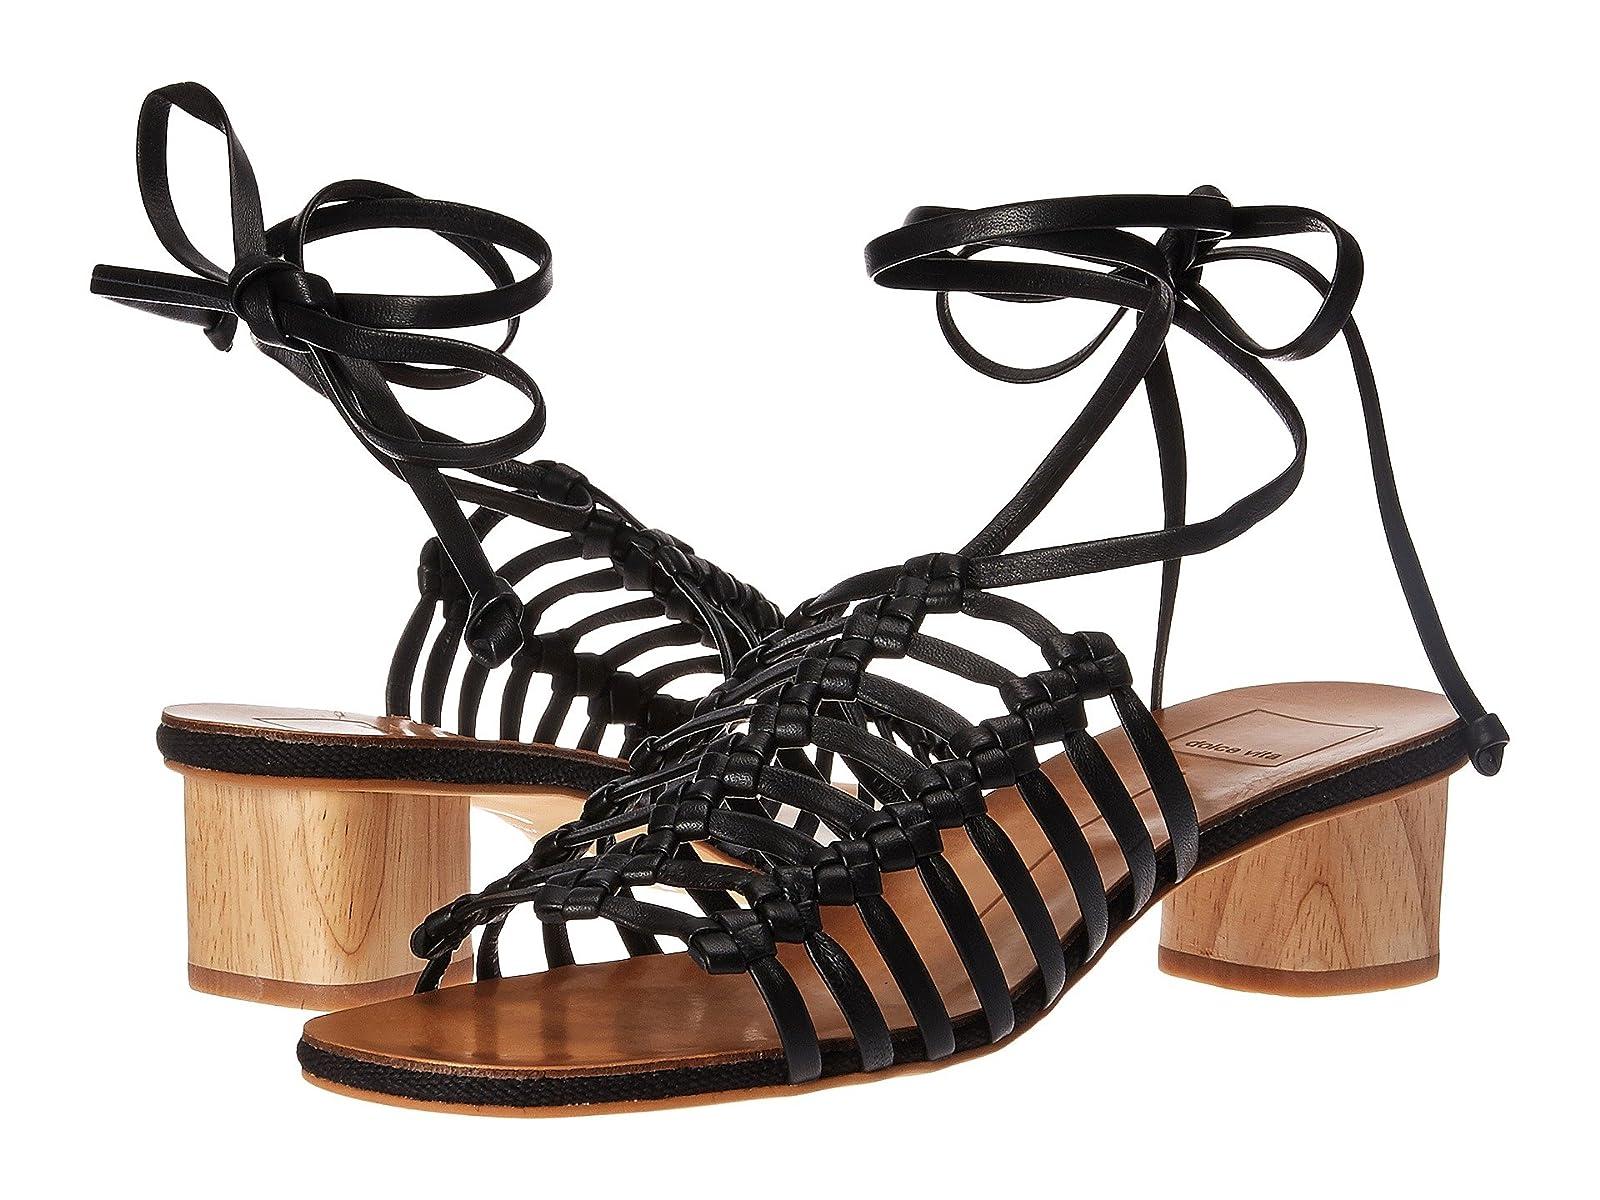 Dolce Vita KaiCheap and distinctive eye-catching shoes